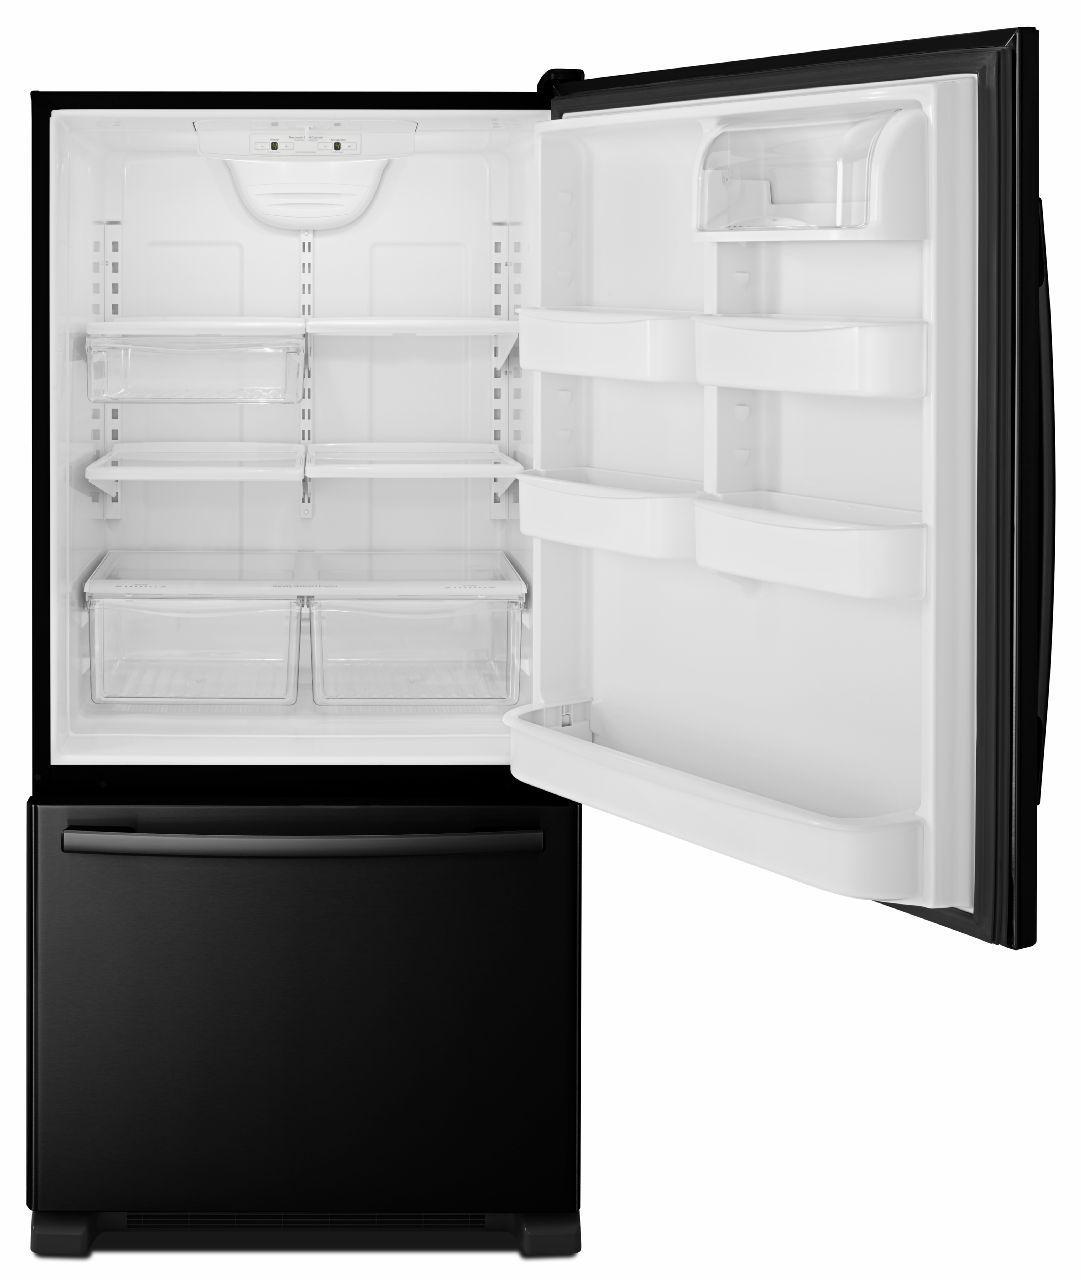 Amana Bottom Mount Refrigerators 22 Cu. Ft. Bottom-Freezer Refrigerator - Item Number: ABB2224BRB